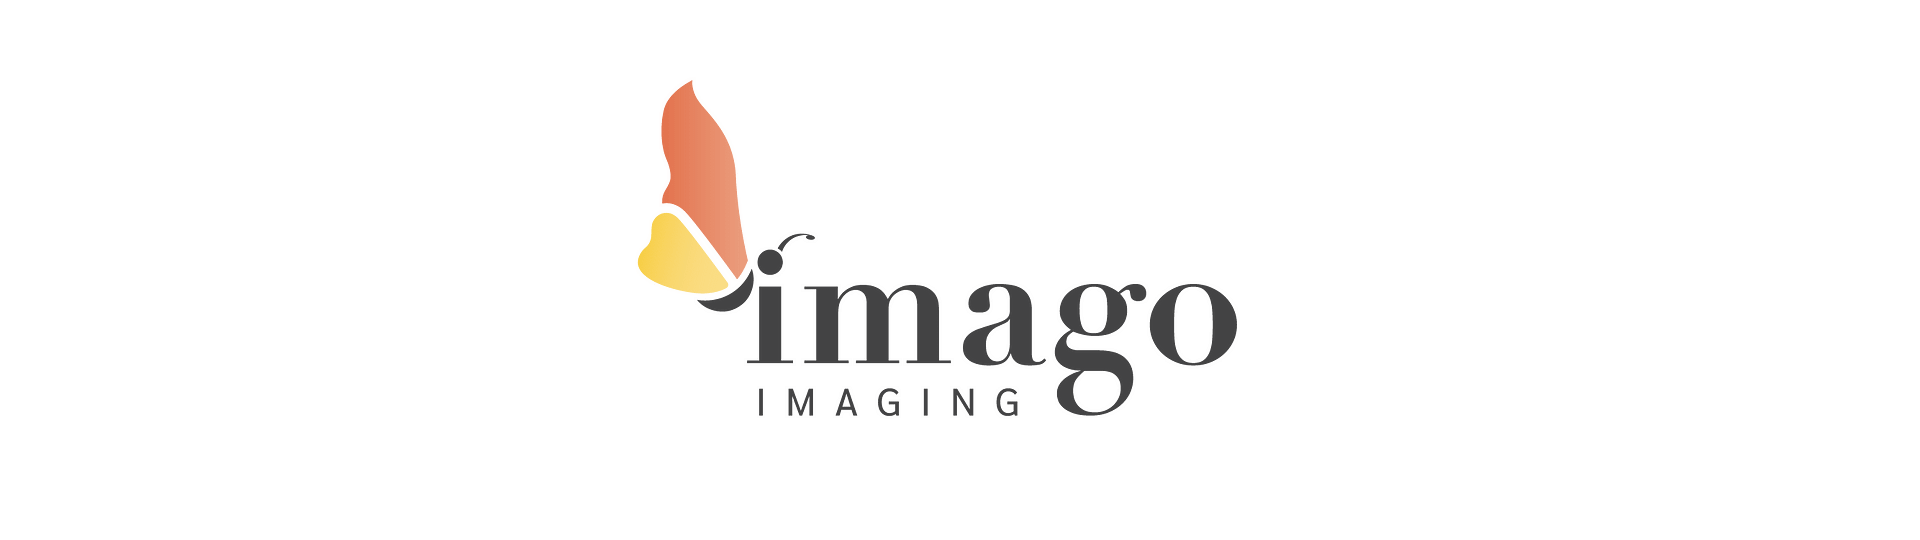 Imago Imaging logo